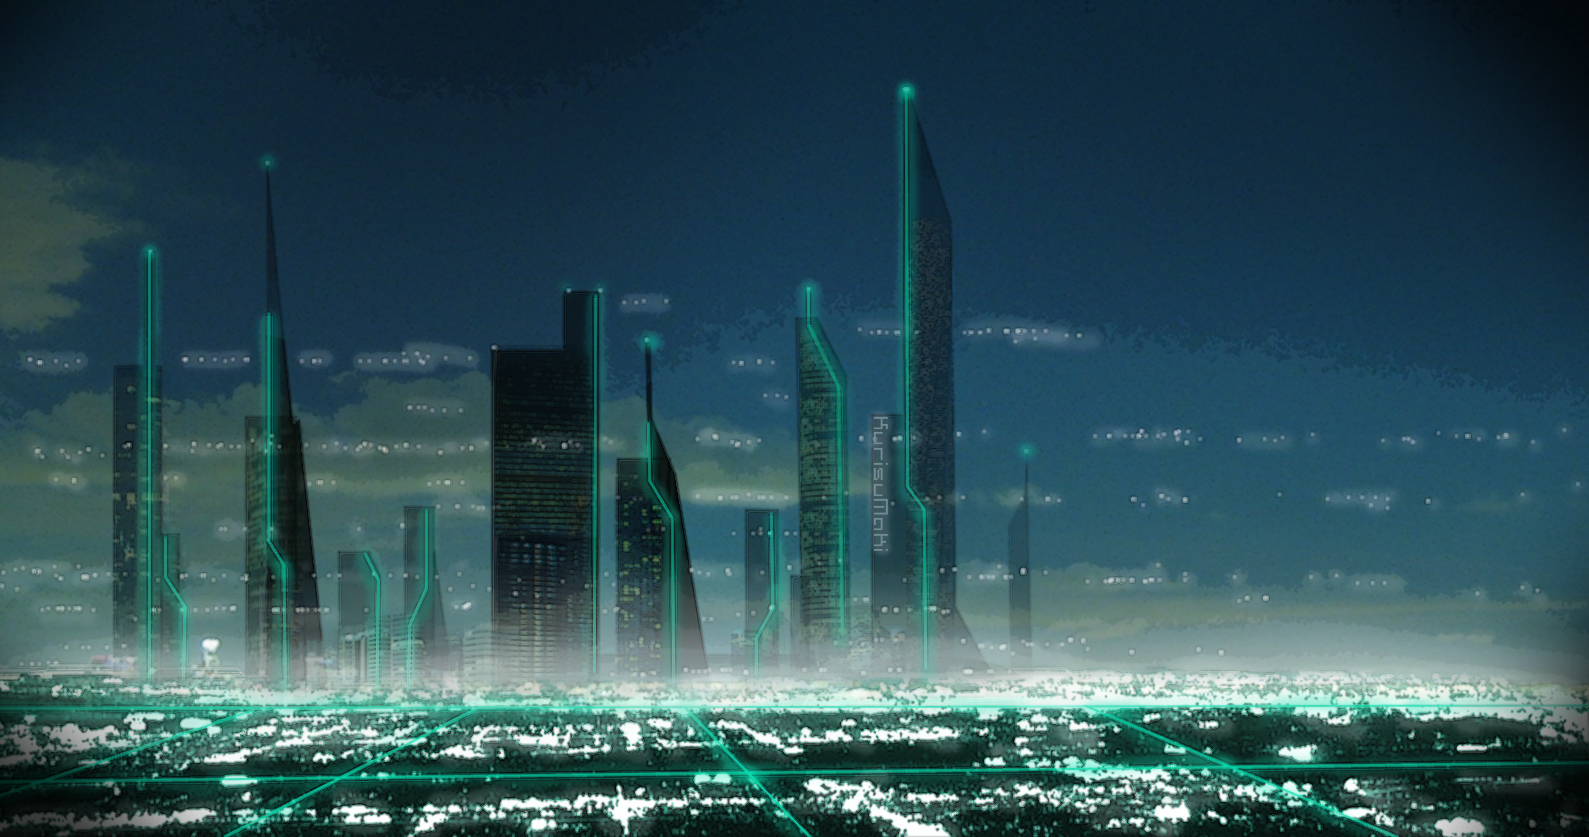 Futuristic City by cMac89